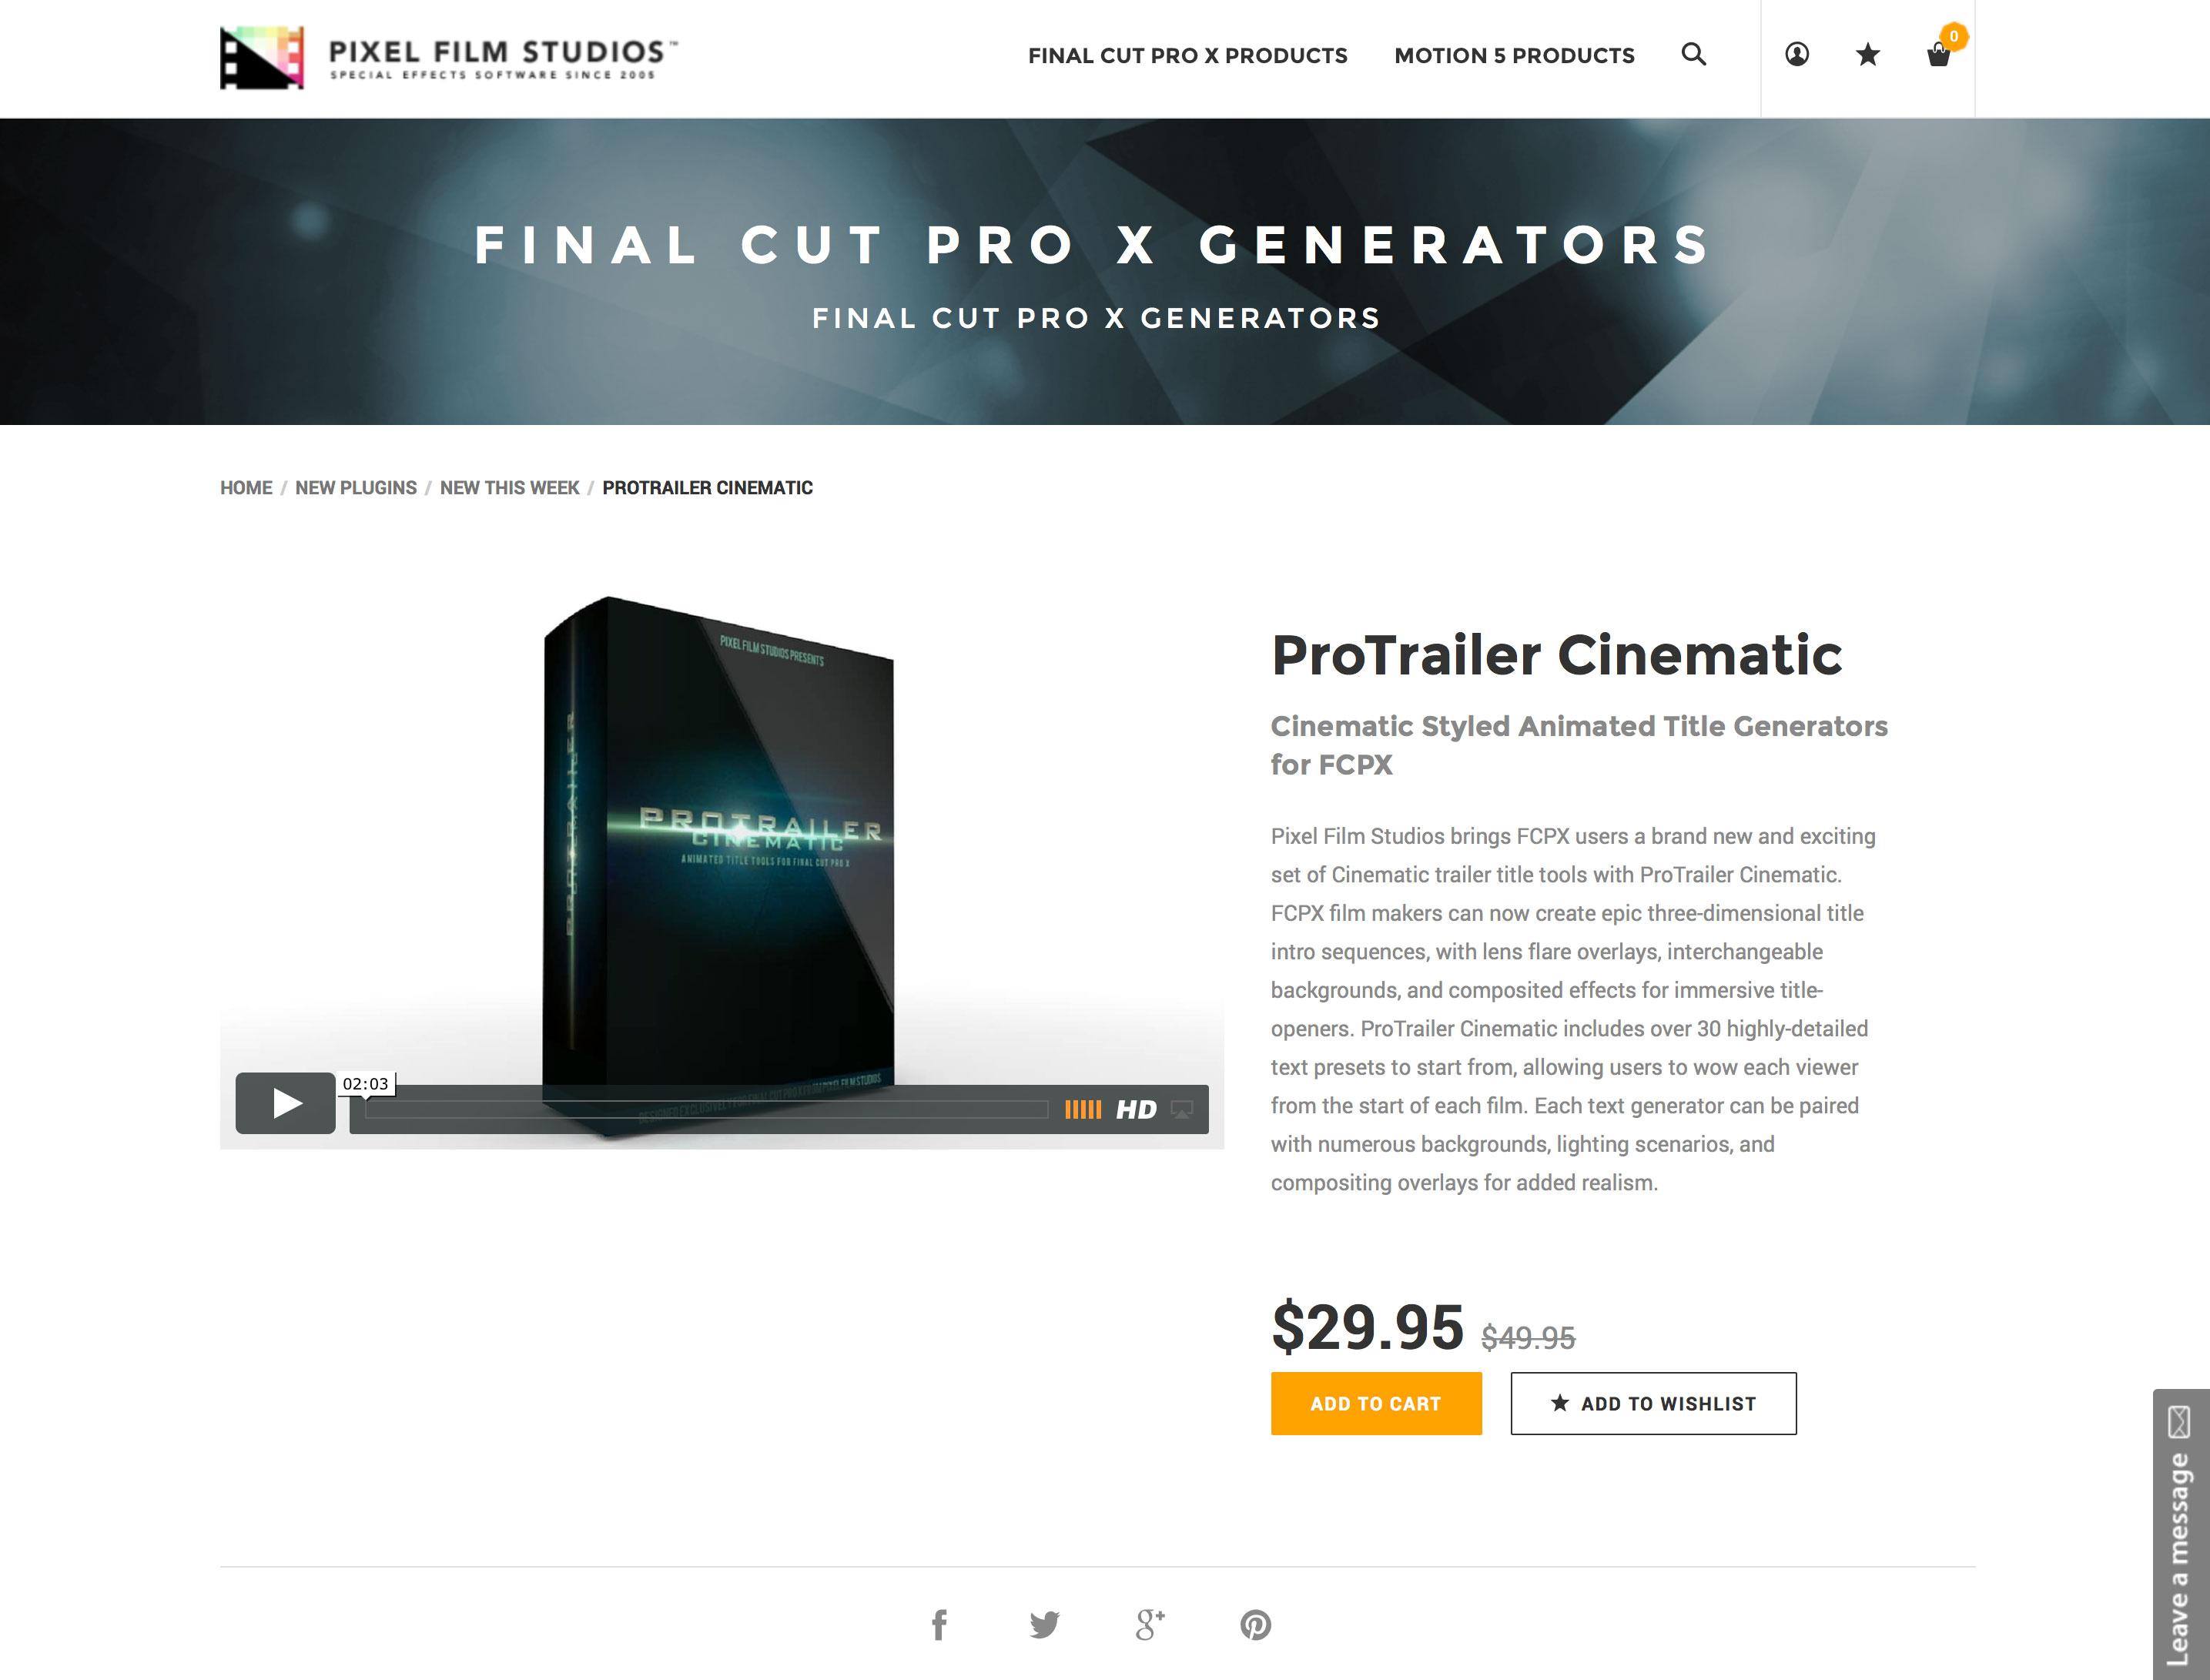 Pixel Film Studios Development Team Releases ProTrailer